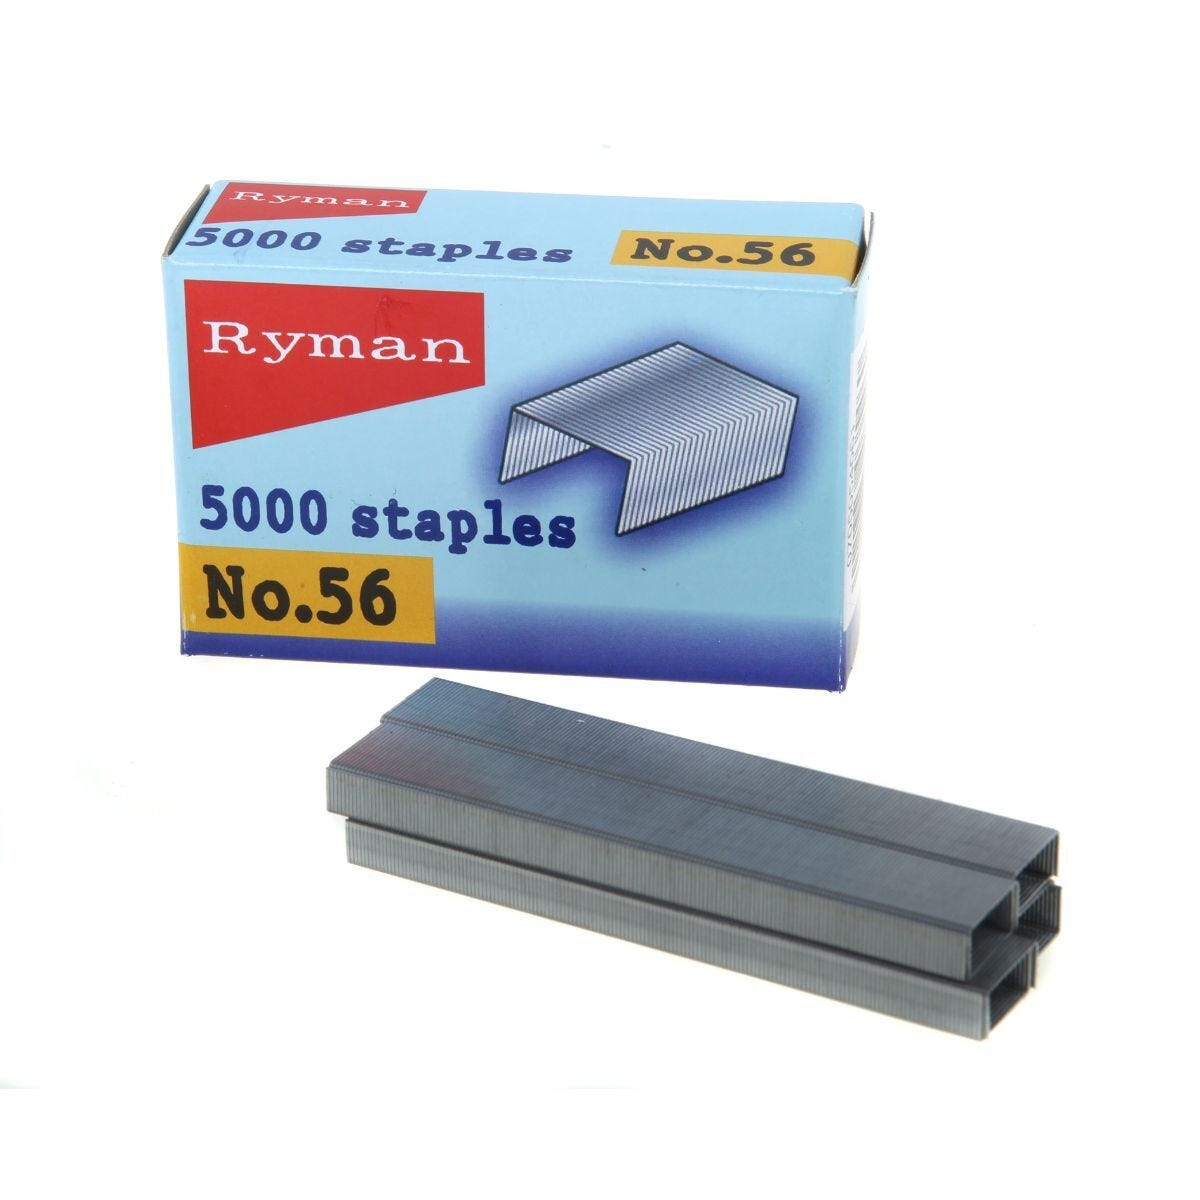 Ryman Staples 26/6mm No56 Pack of 5000